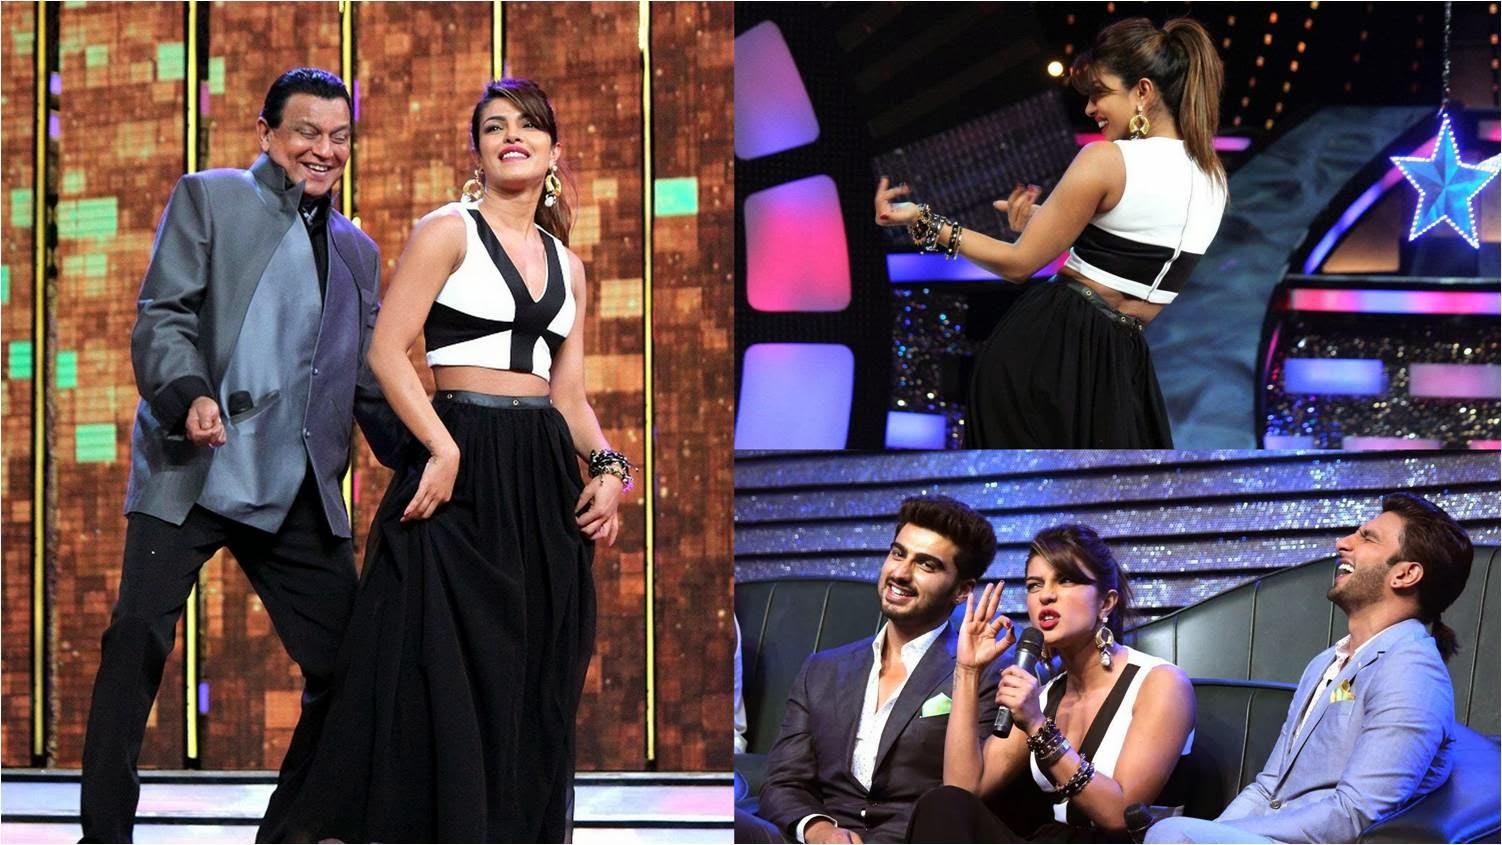 Mithun Chakraborty, Arjun Kapoor, Priyanka Chopra and Ranveer Singh at Dance India Dance